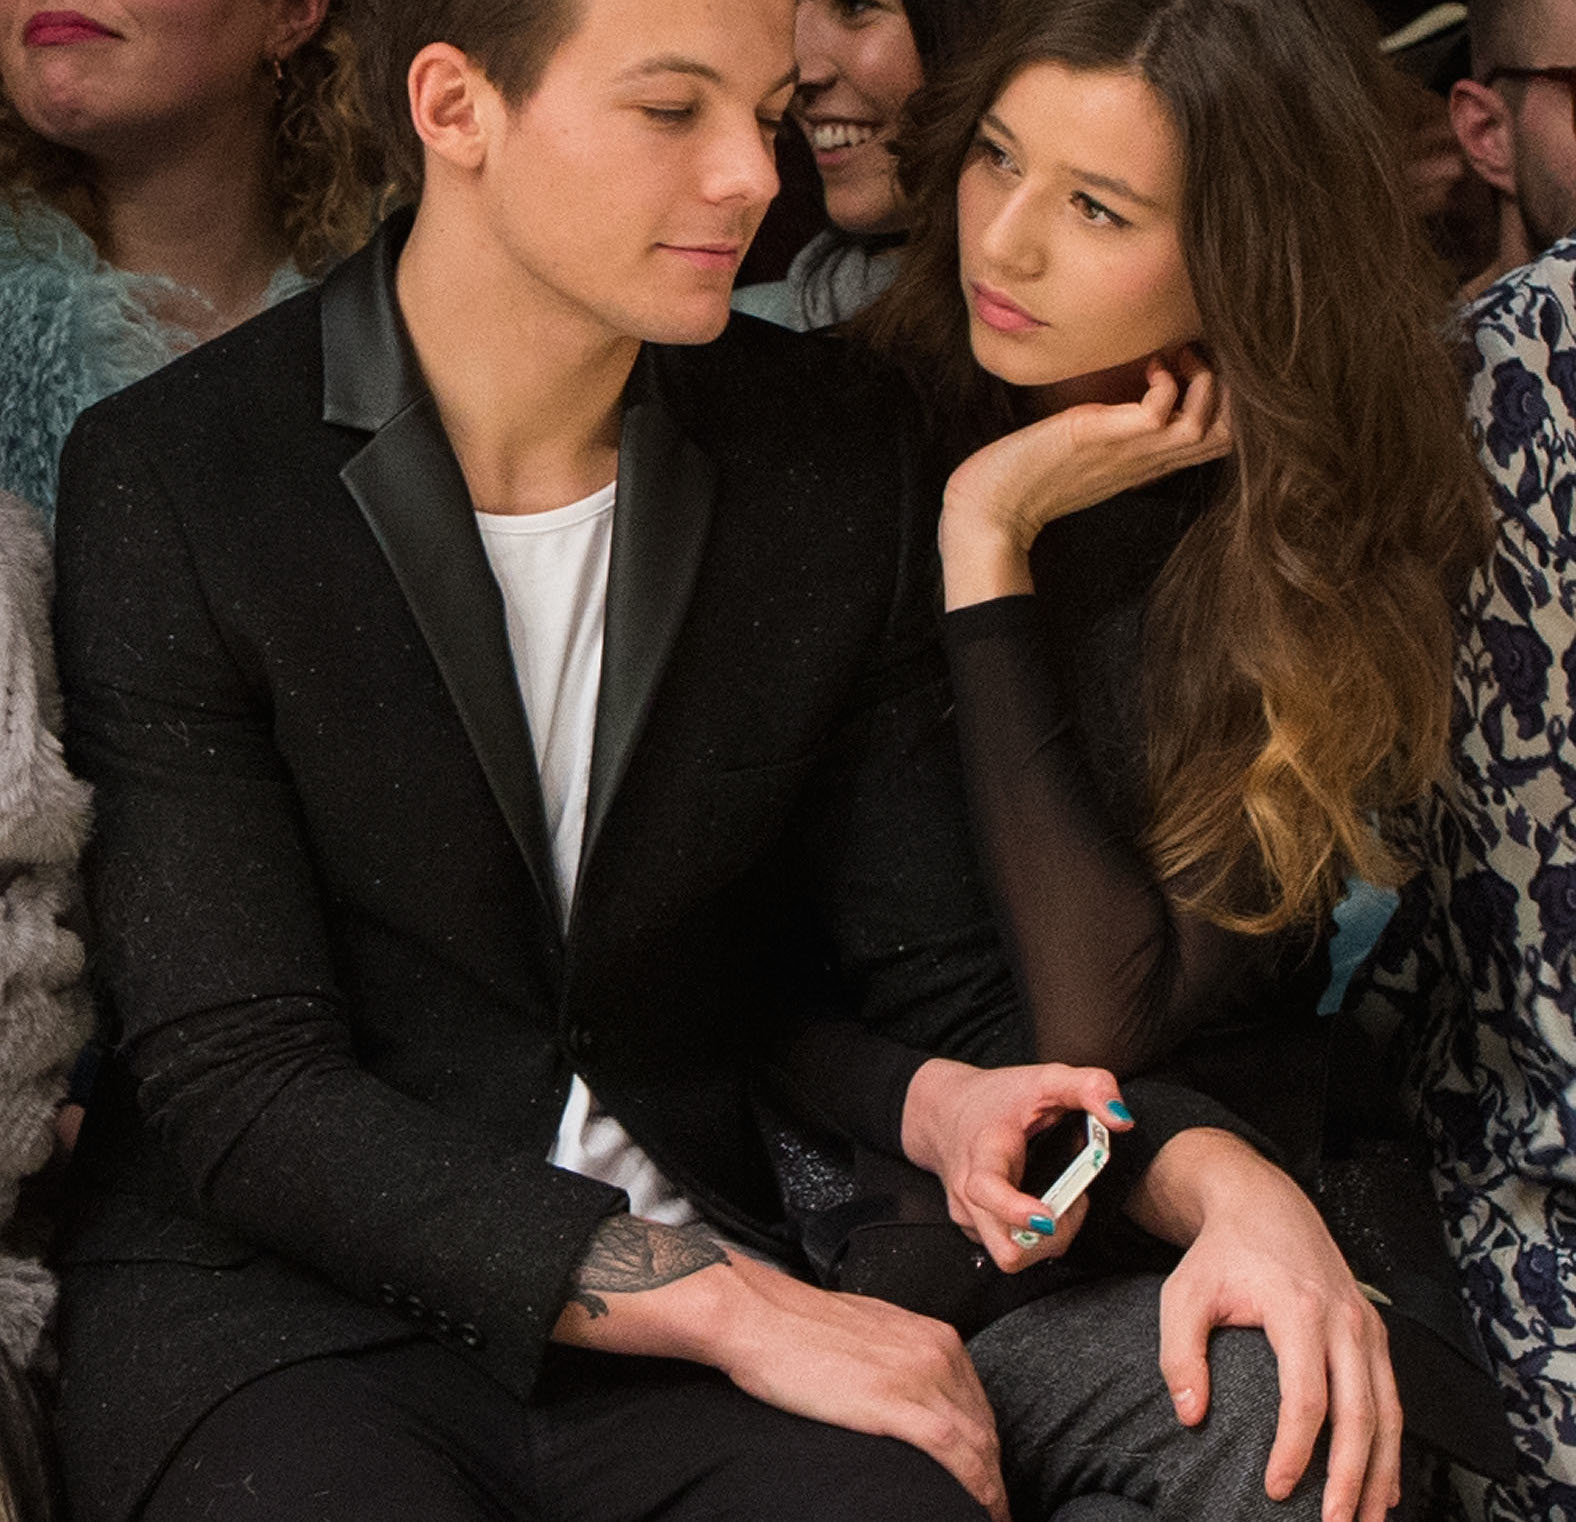 Louis Tomlinson and Eleanor Calder Break Up Rumors After ...